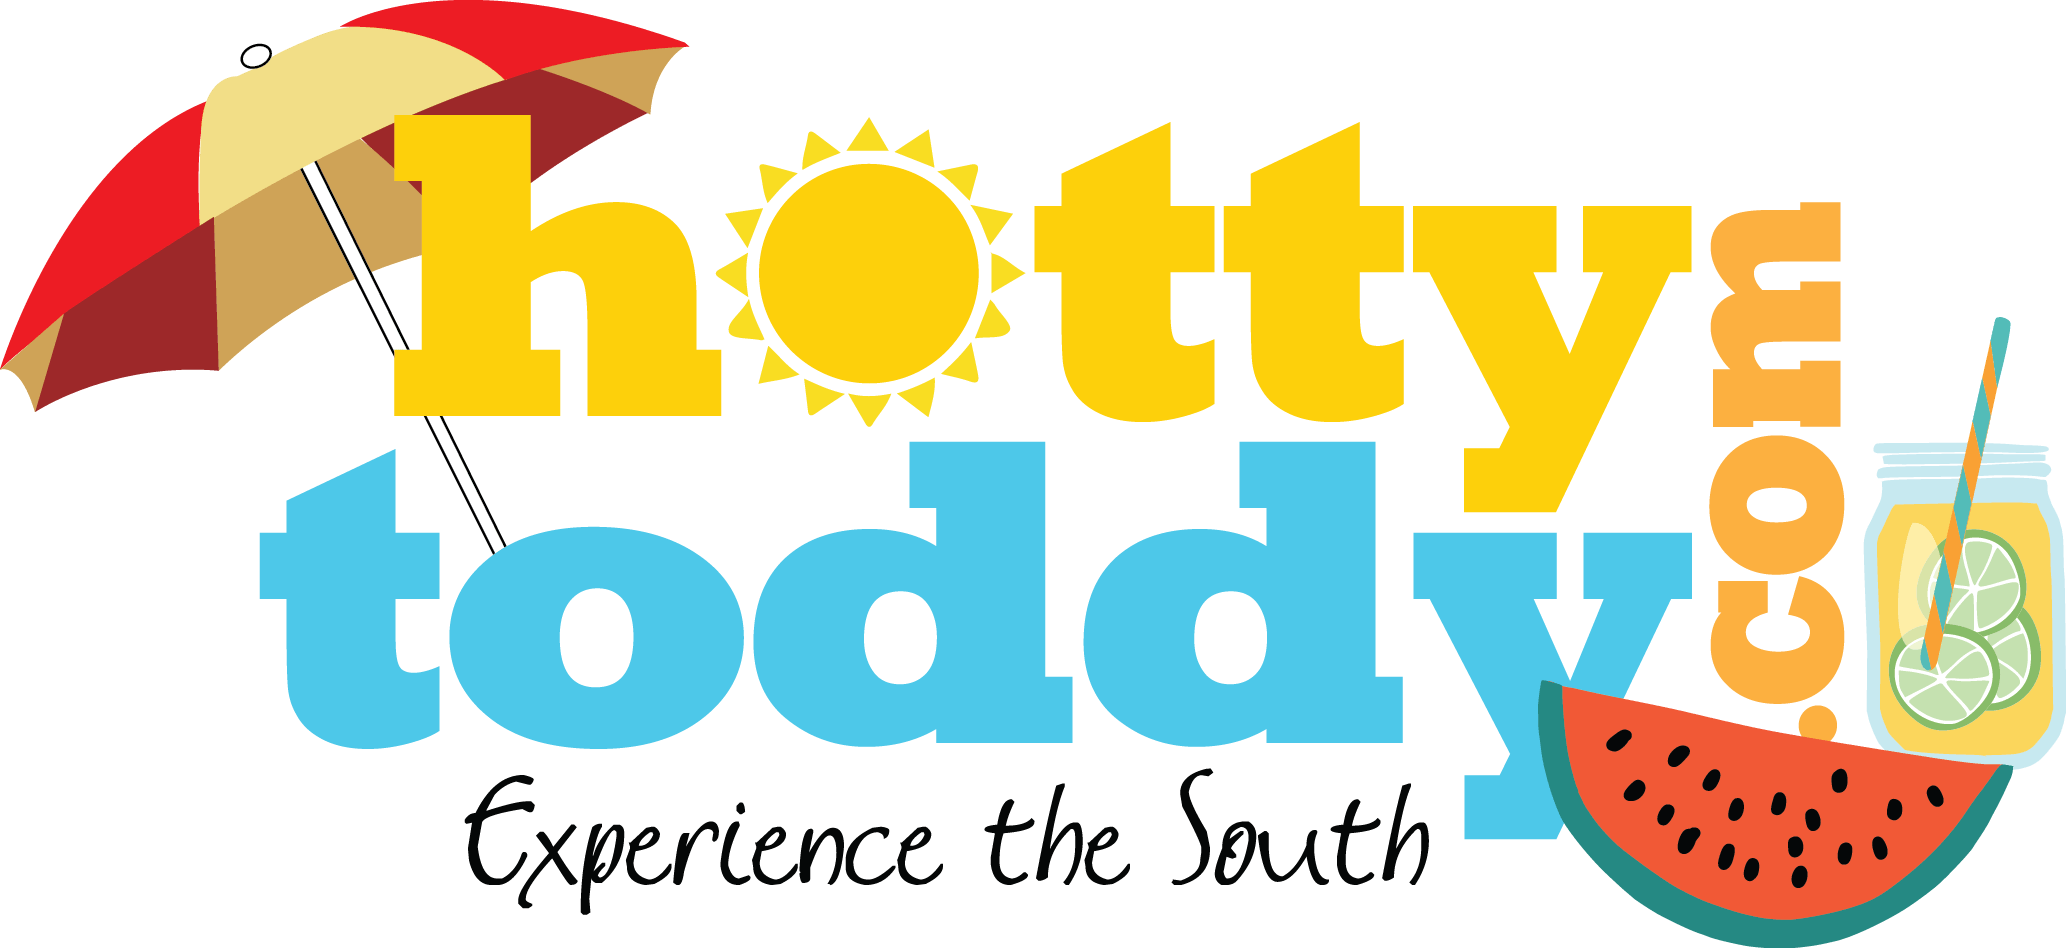 hottytoddy.com logo